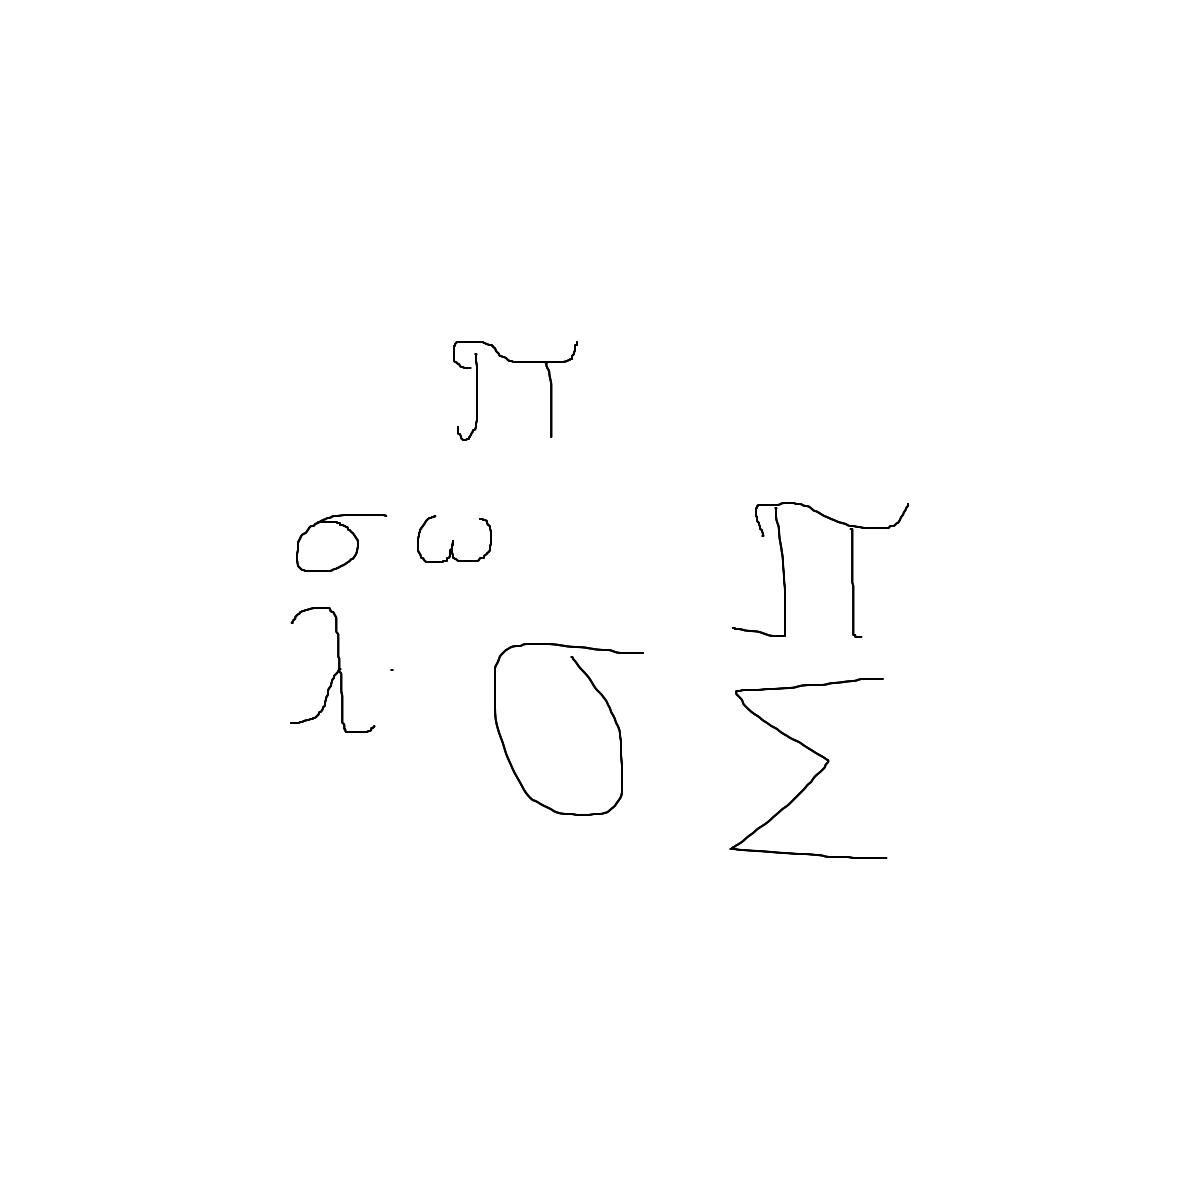 BAAAM drawing#768 lat:38.2967224121093750lng: 21.8272209167480470